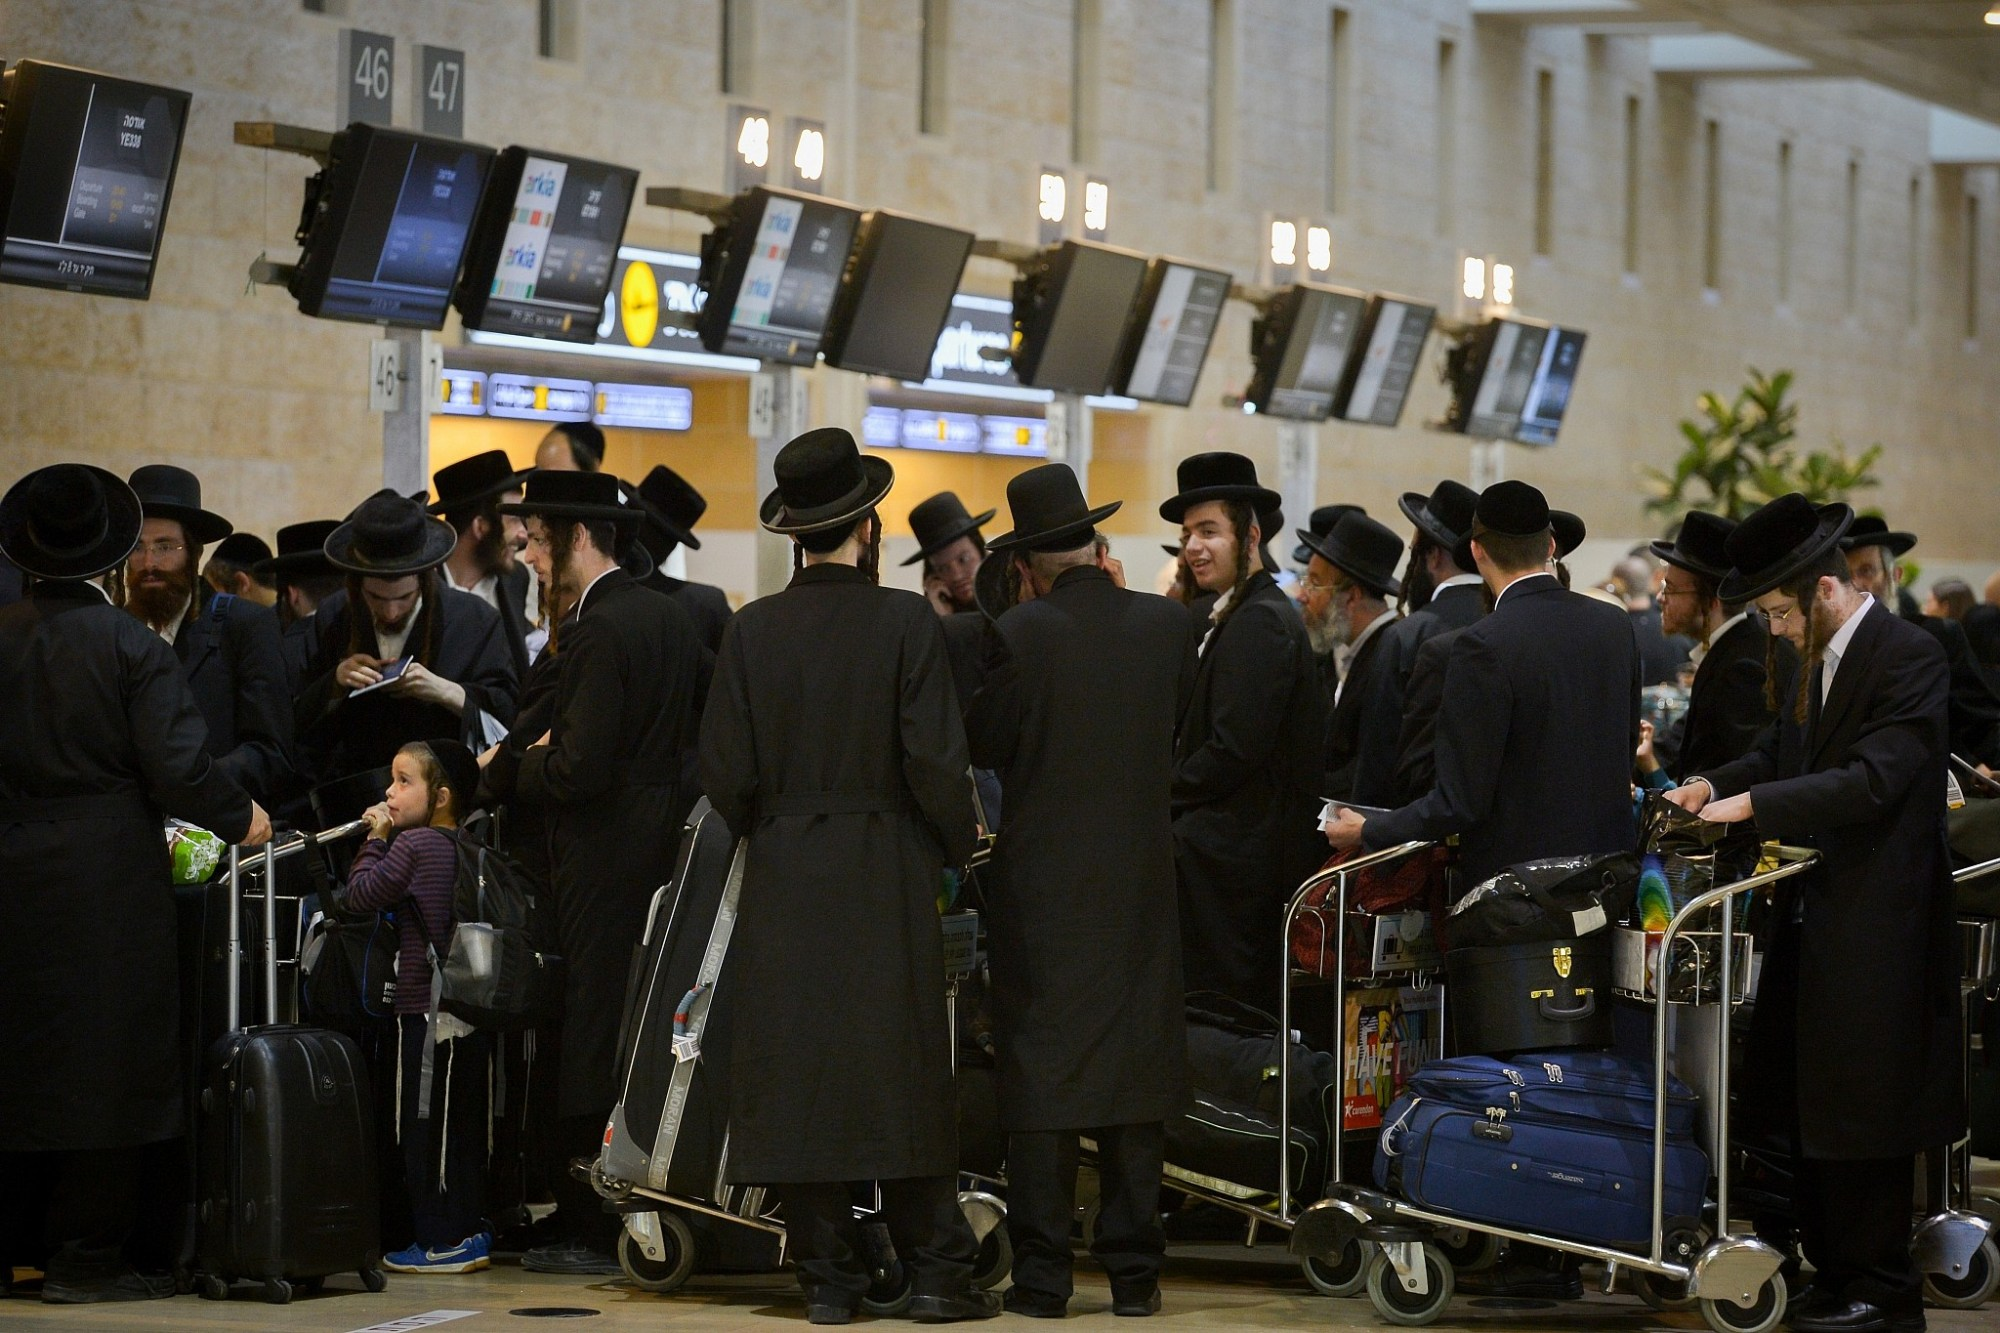 hight resolution of ultra orthodox jewish men traveling to uman in the ukraine for rosh hashanah seen